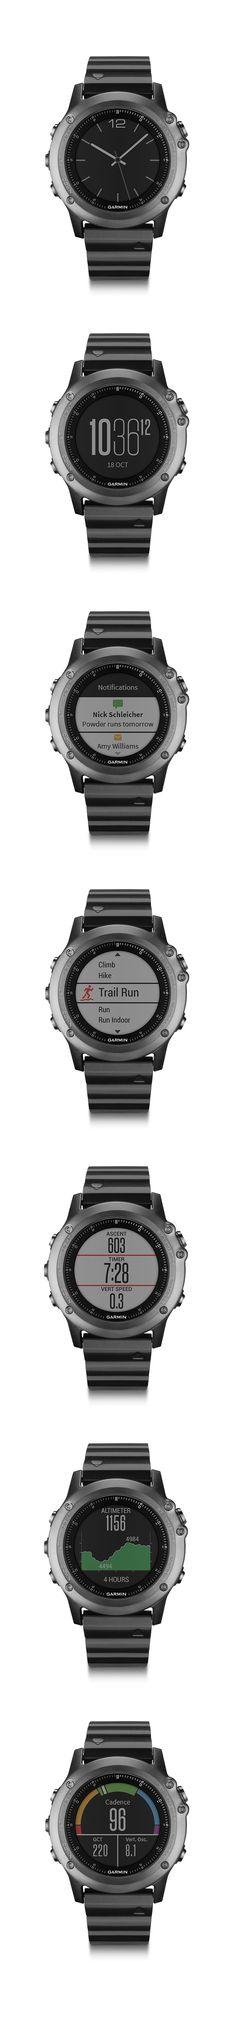 Fenix 3 Sapphire. World's first adventure sport training Garmin GPS/GLONASS watch. #Fenix3